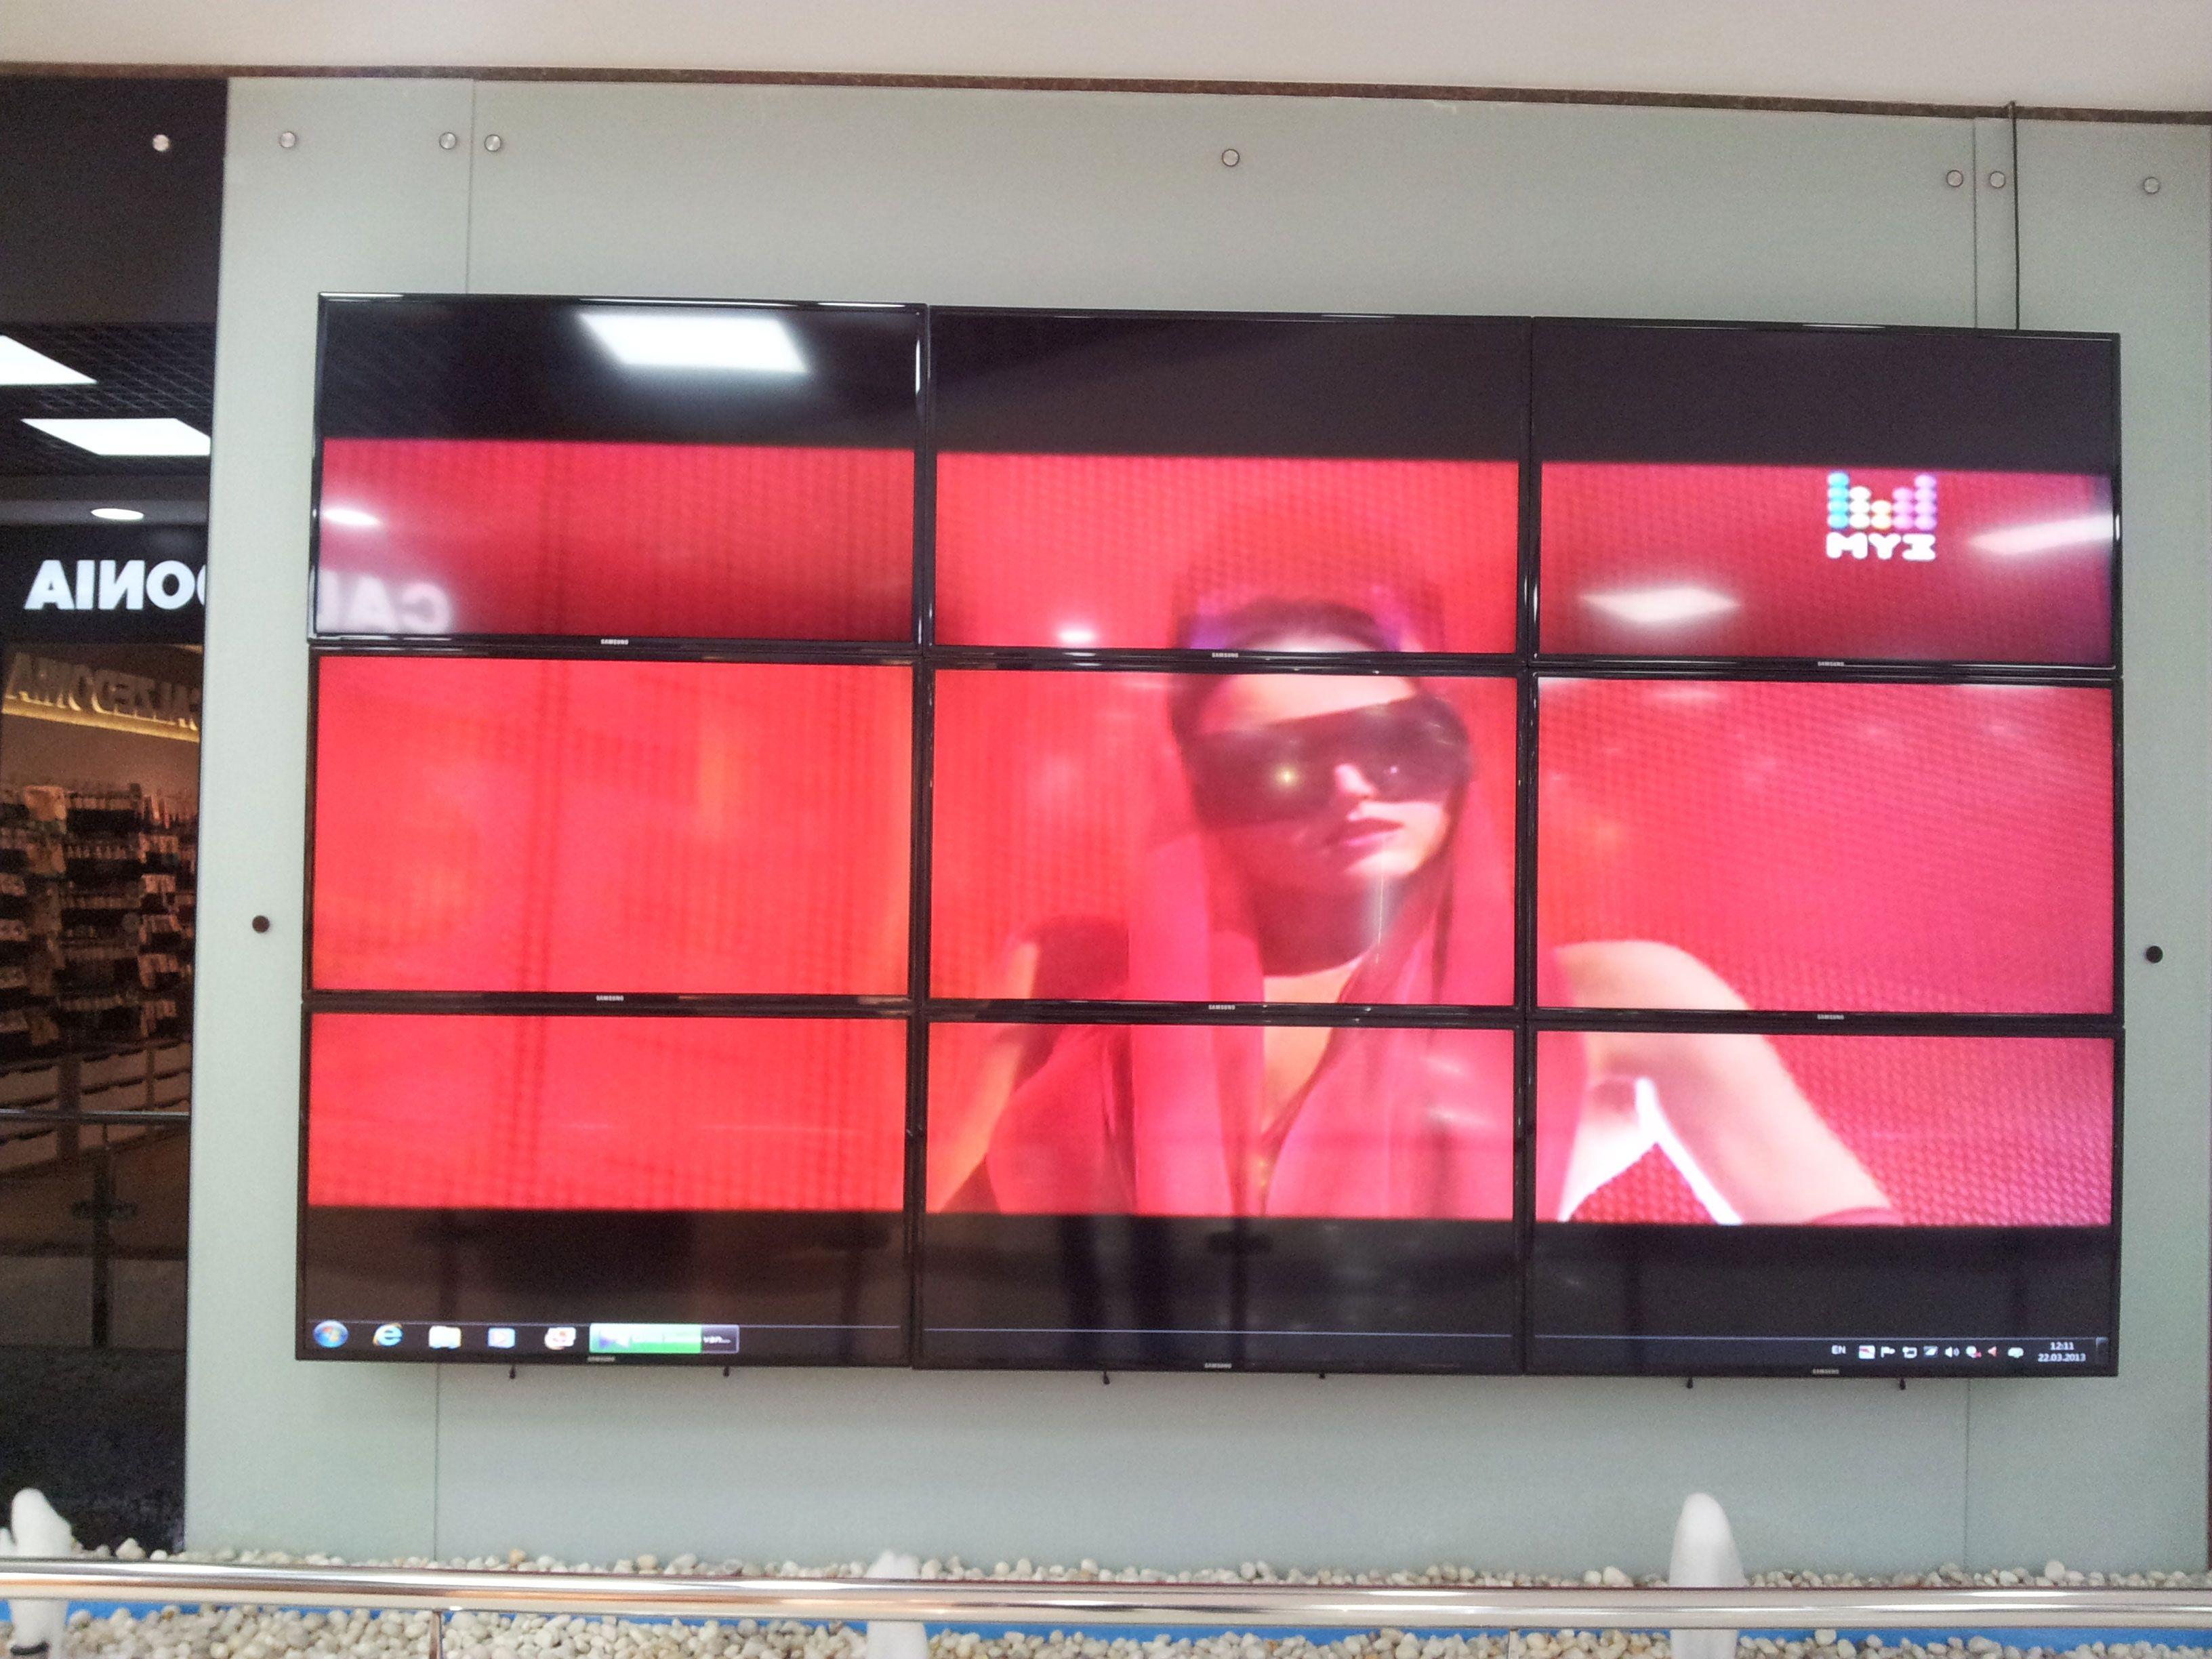 digital window, prolab digital windowscapes transforms any window ...